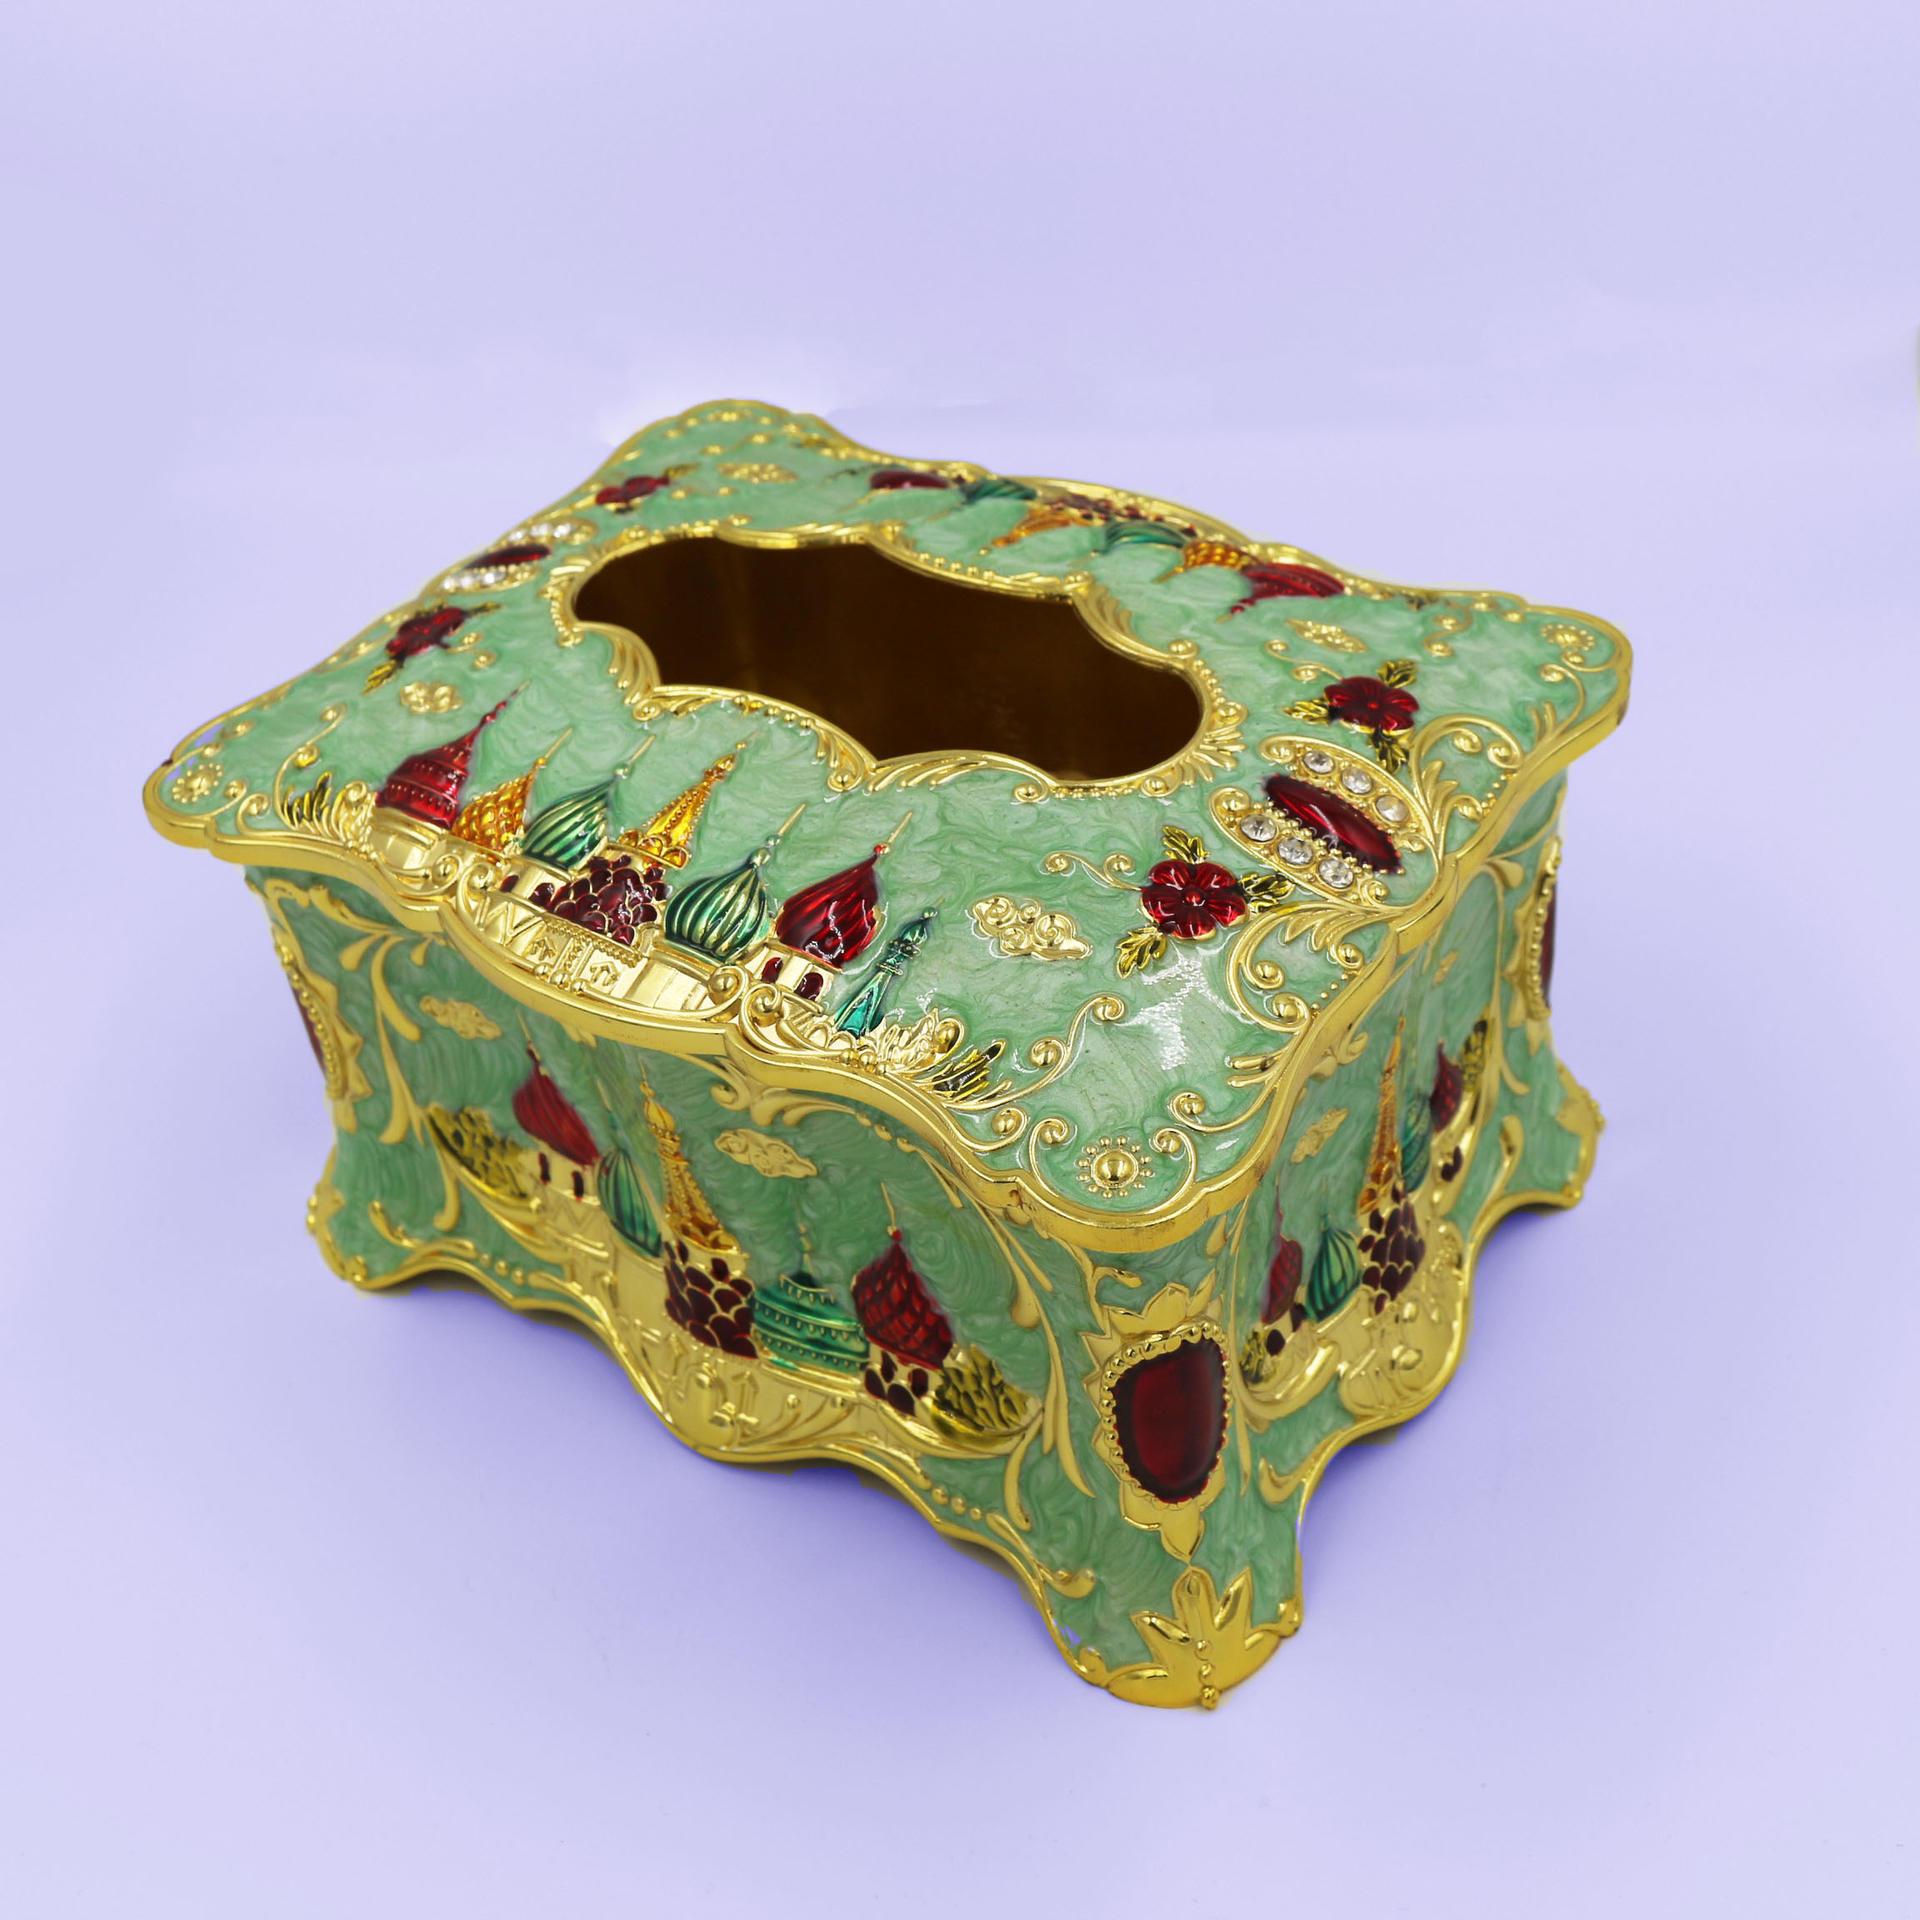 European retro fashion castle tissue box